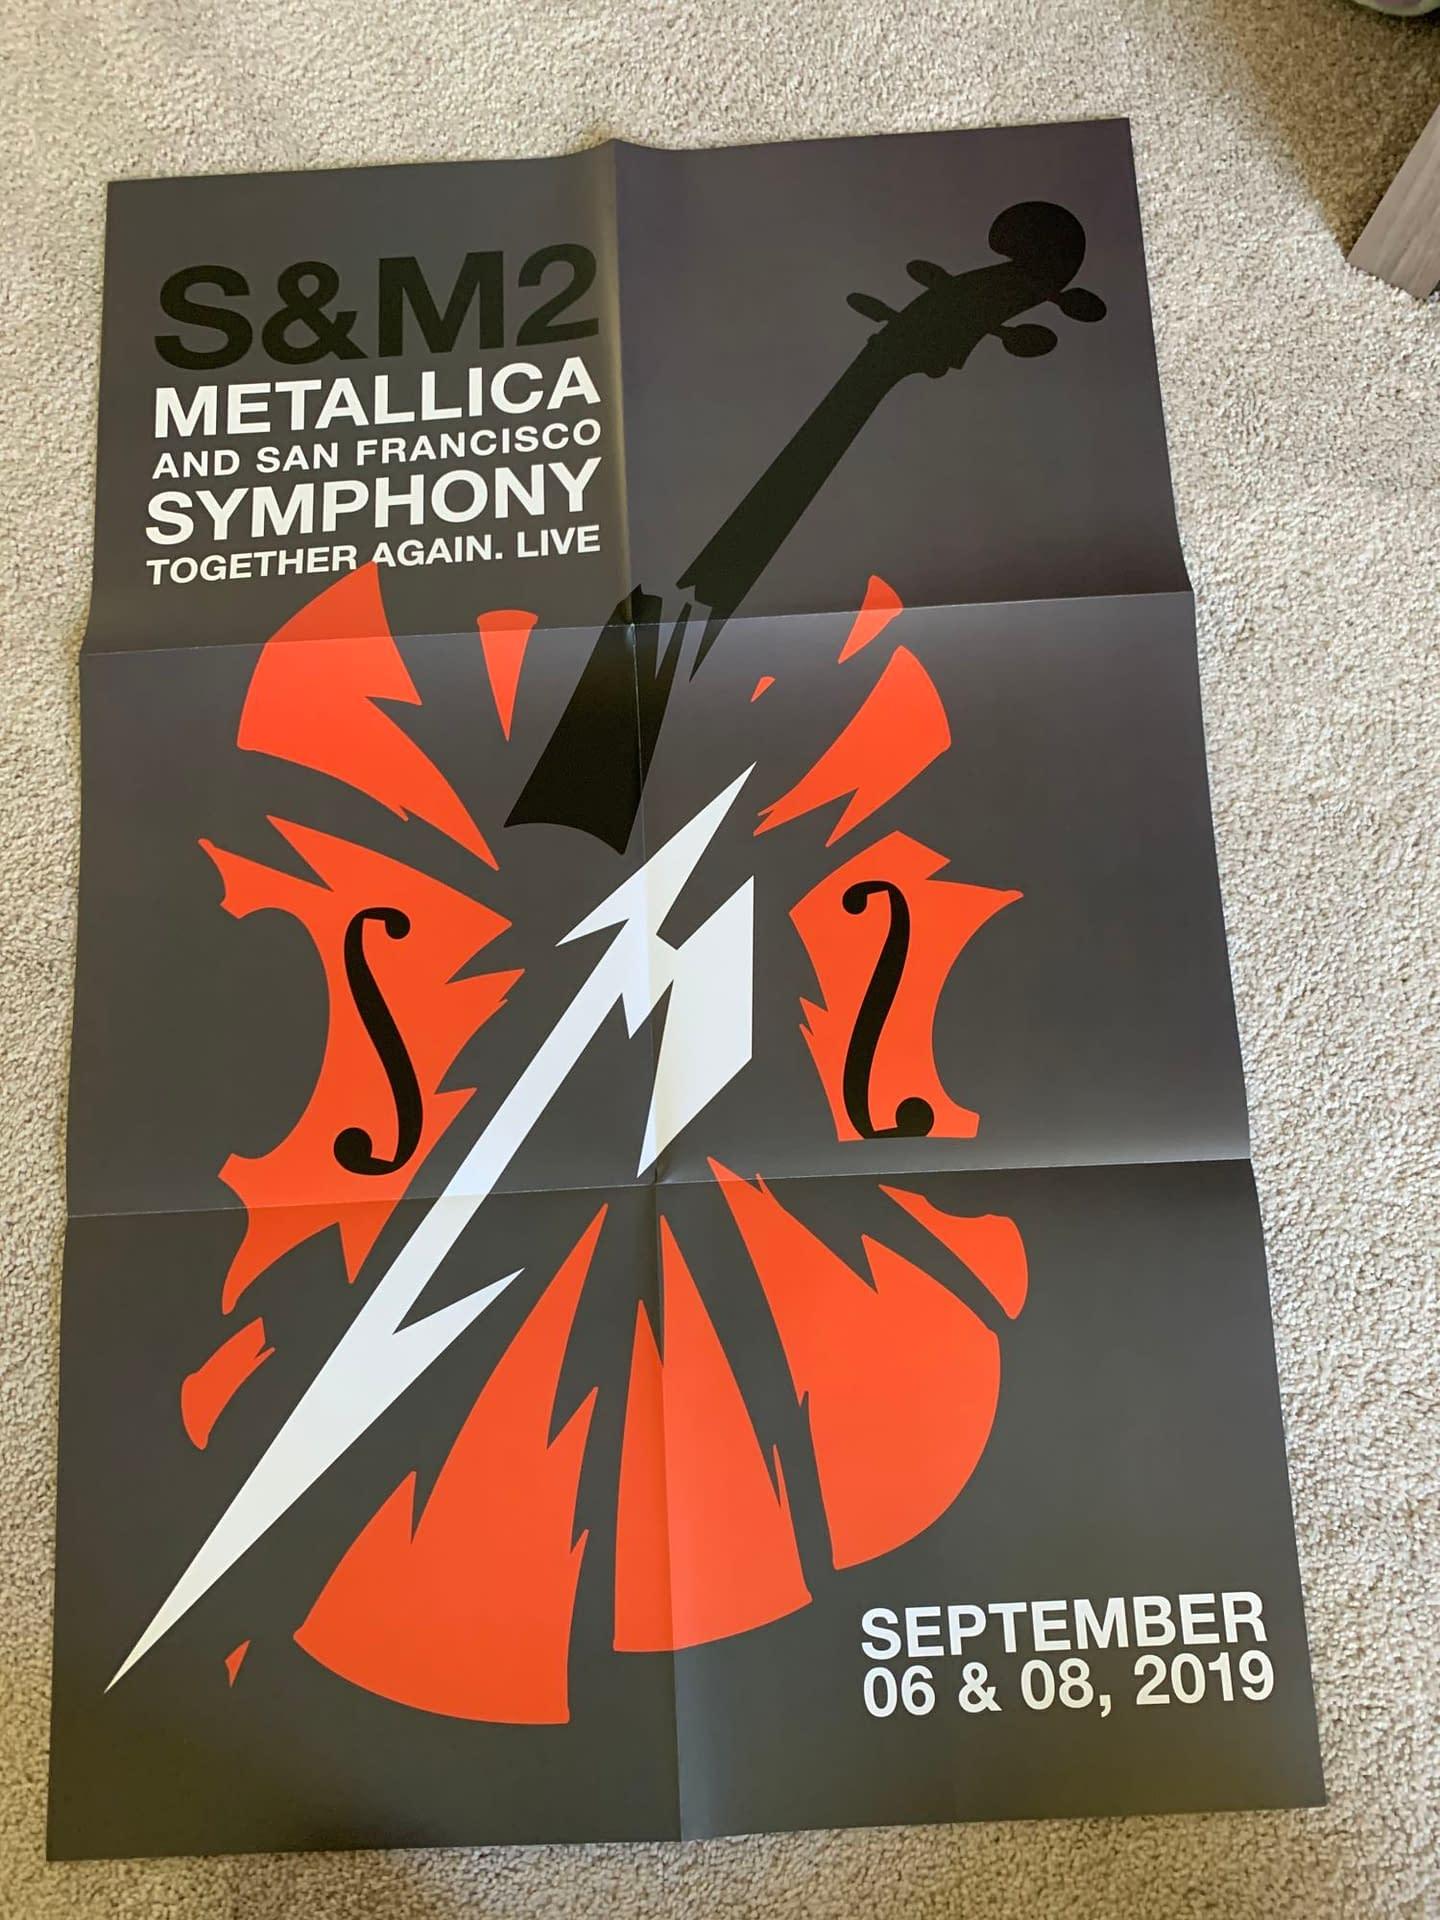 Metallica Mondays Bonus: We Unbox S&M 2 Deluxe Vinyl Set